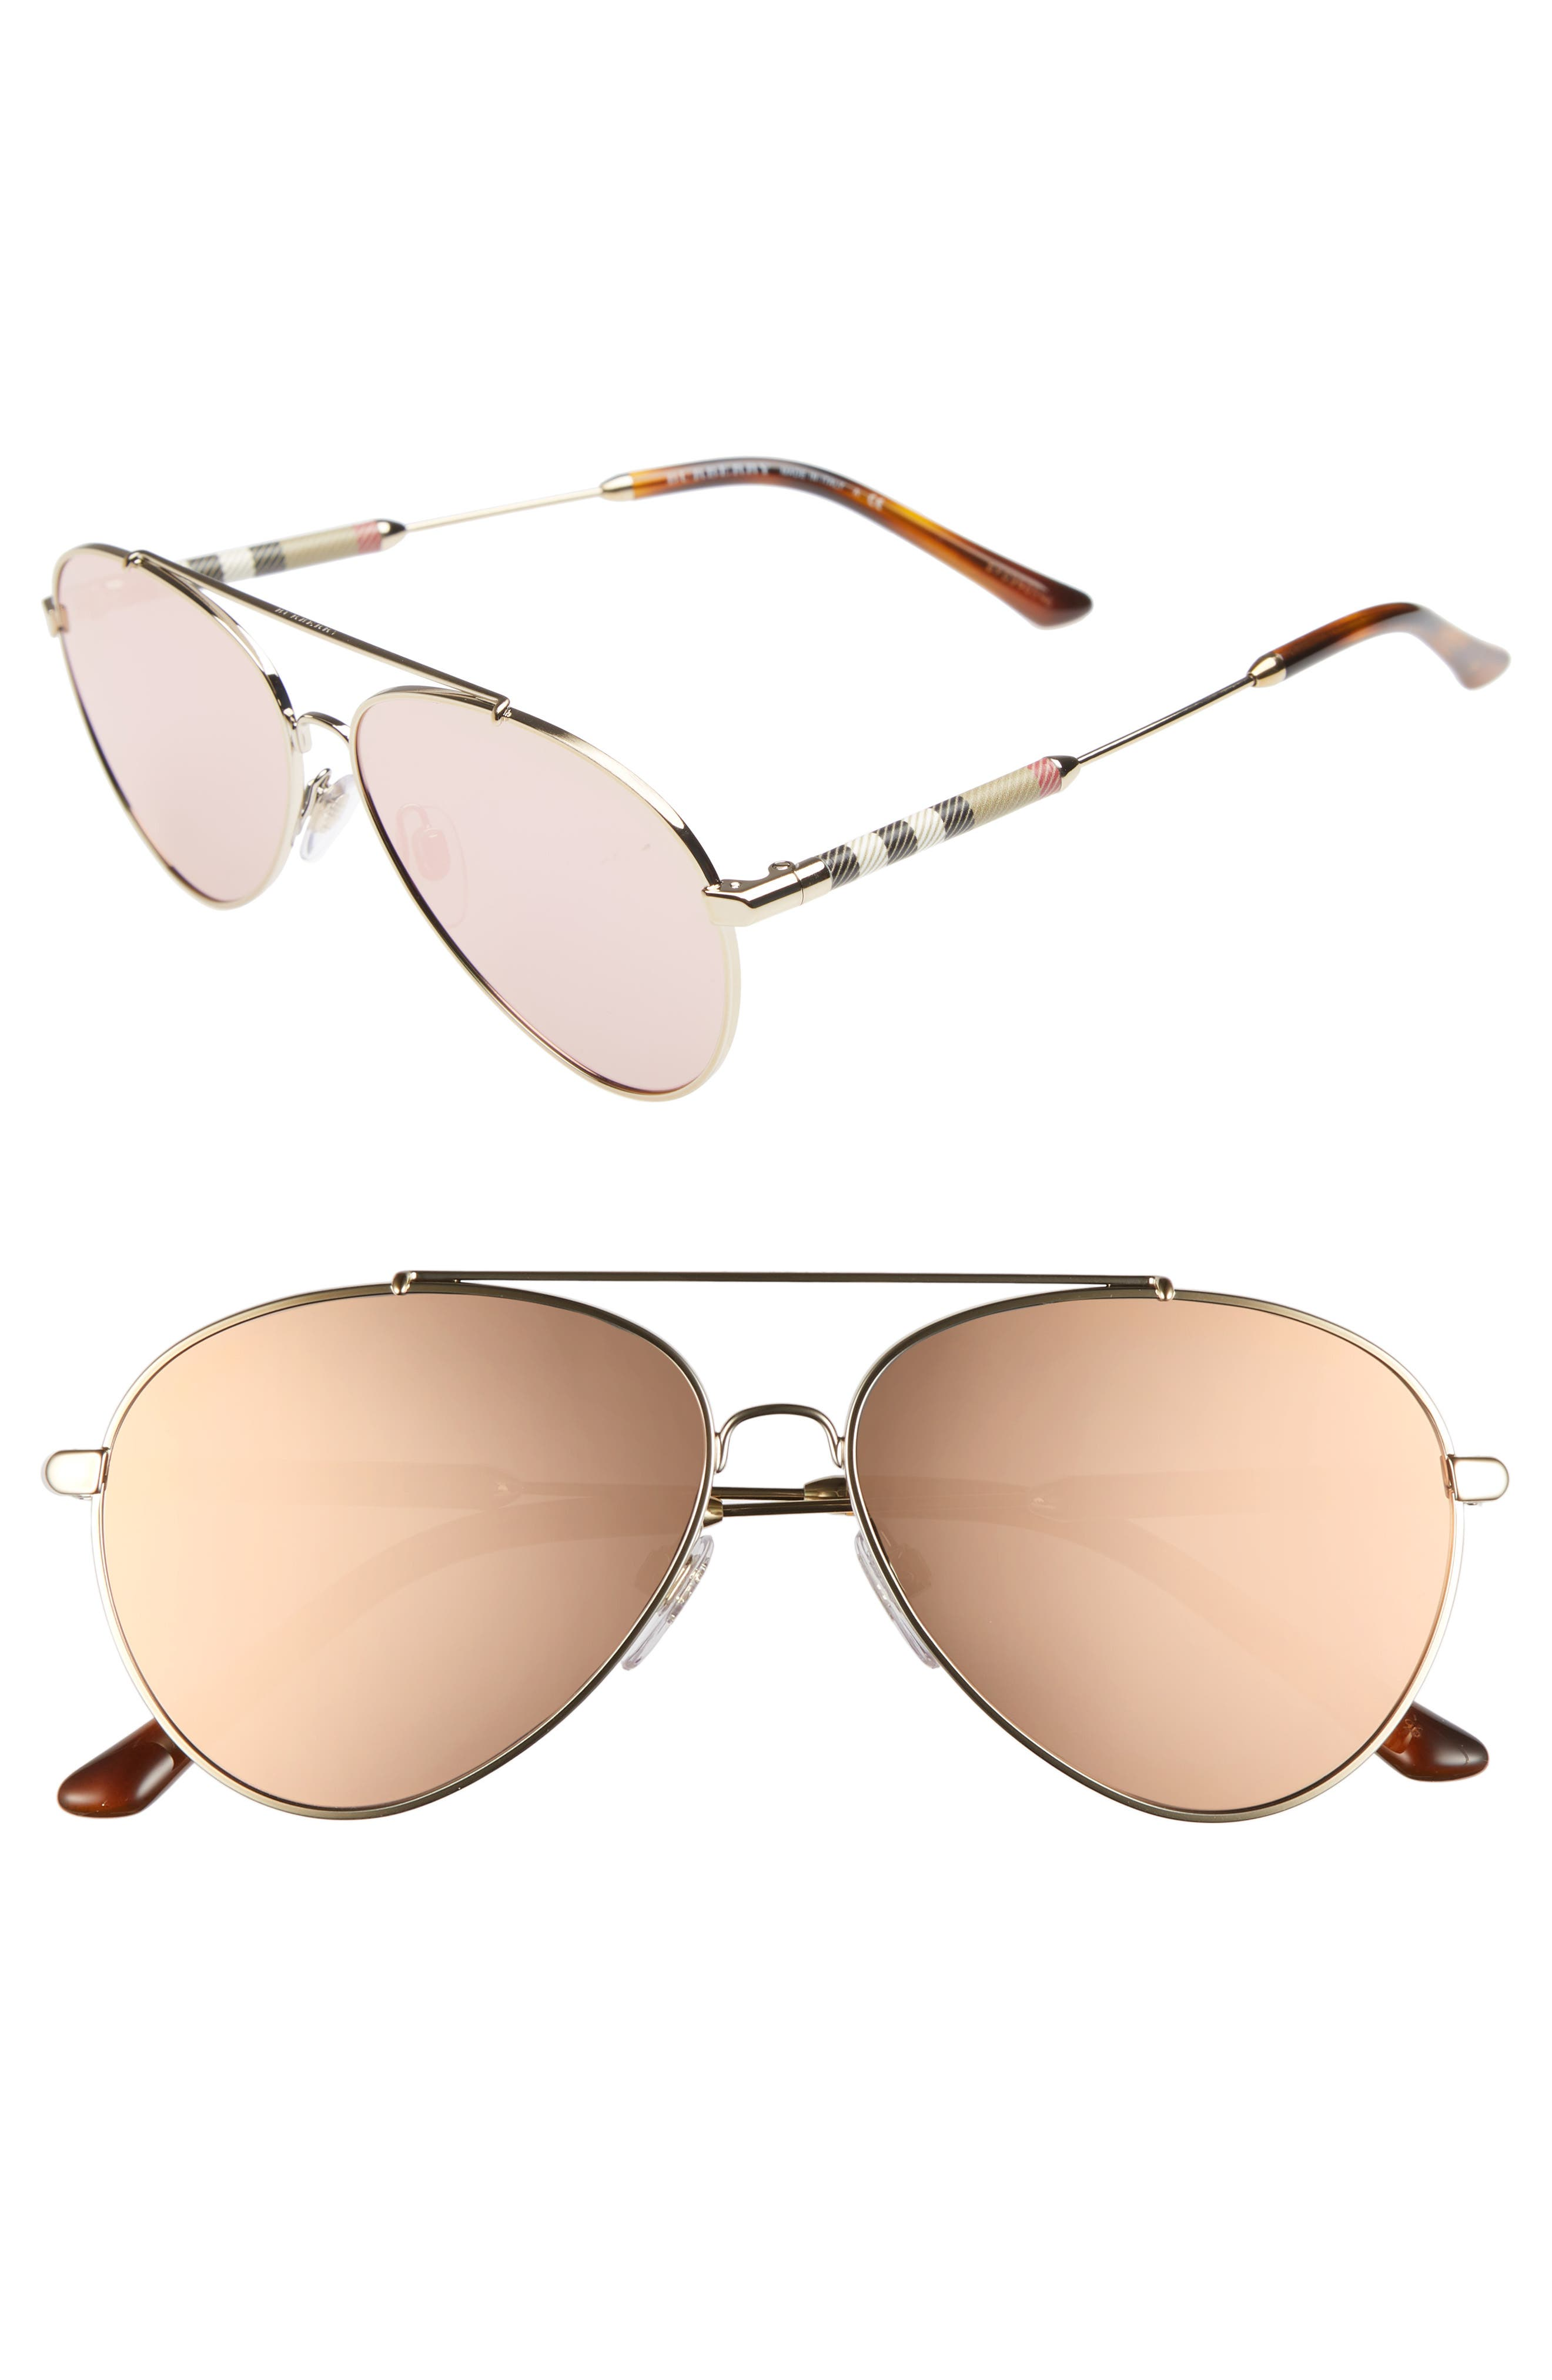 57mm Mirrored Aviator Sunglasses,                             Main thumbnail 1, color,                             031